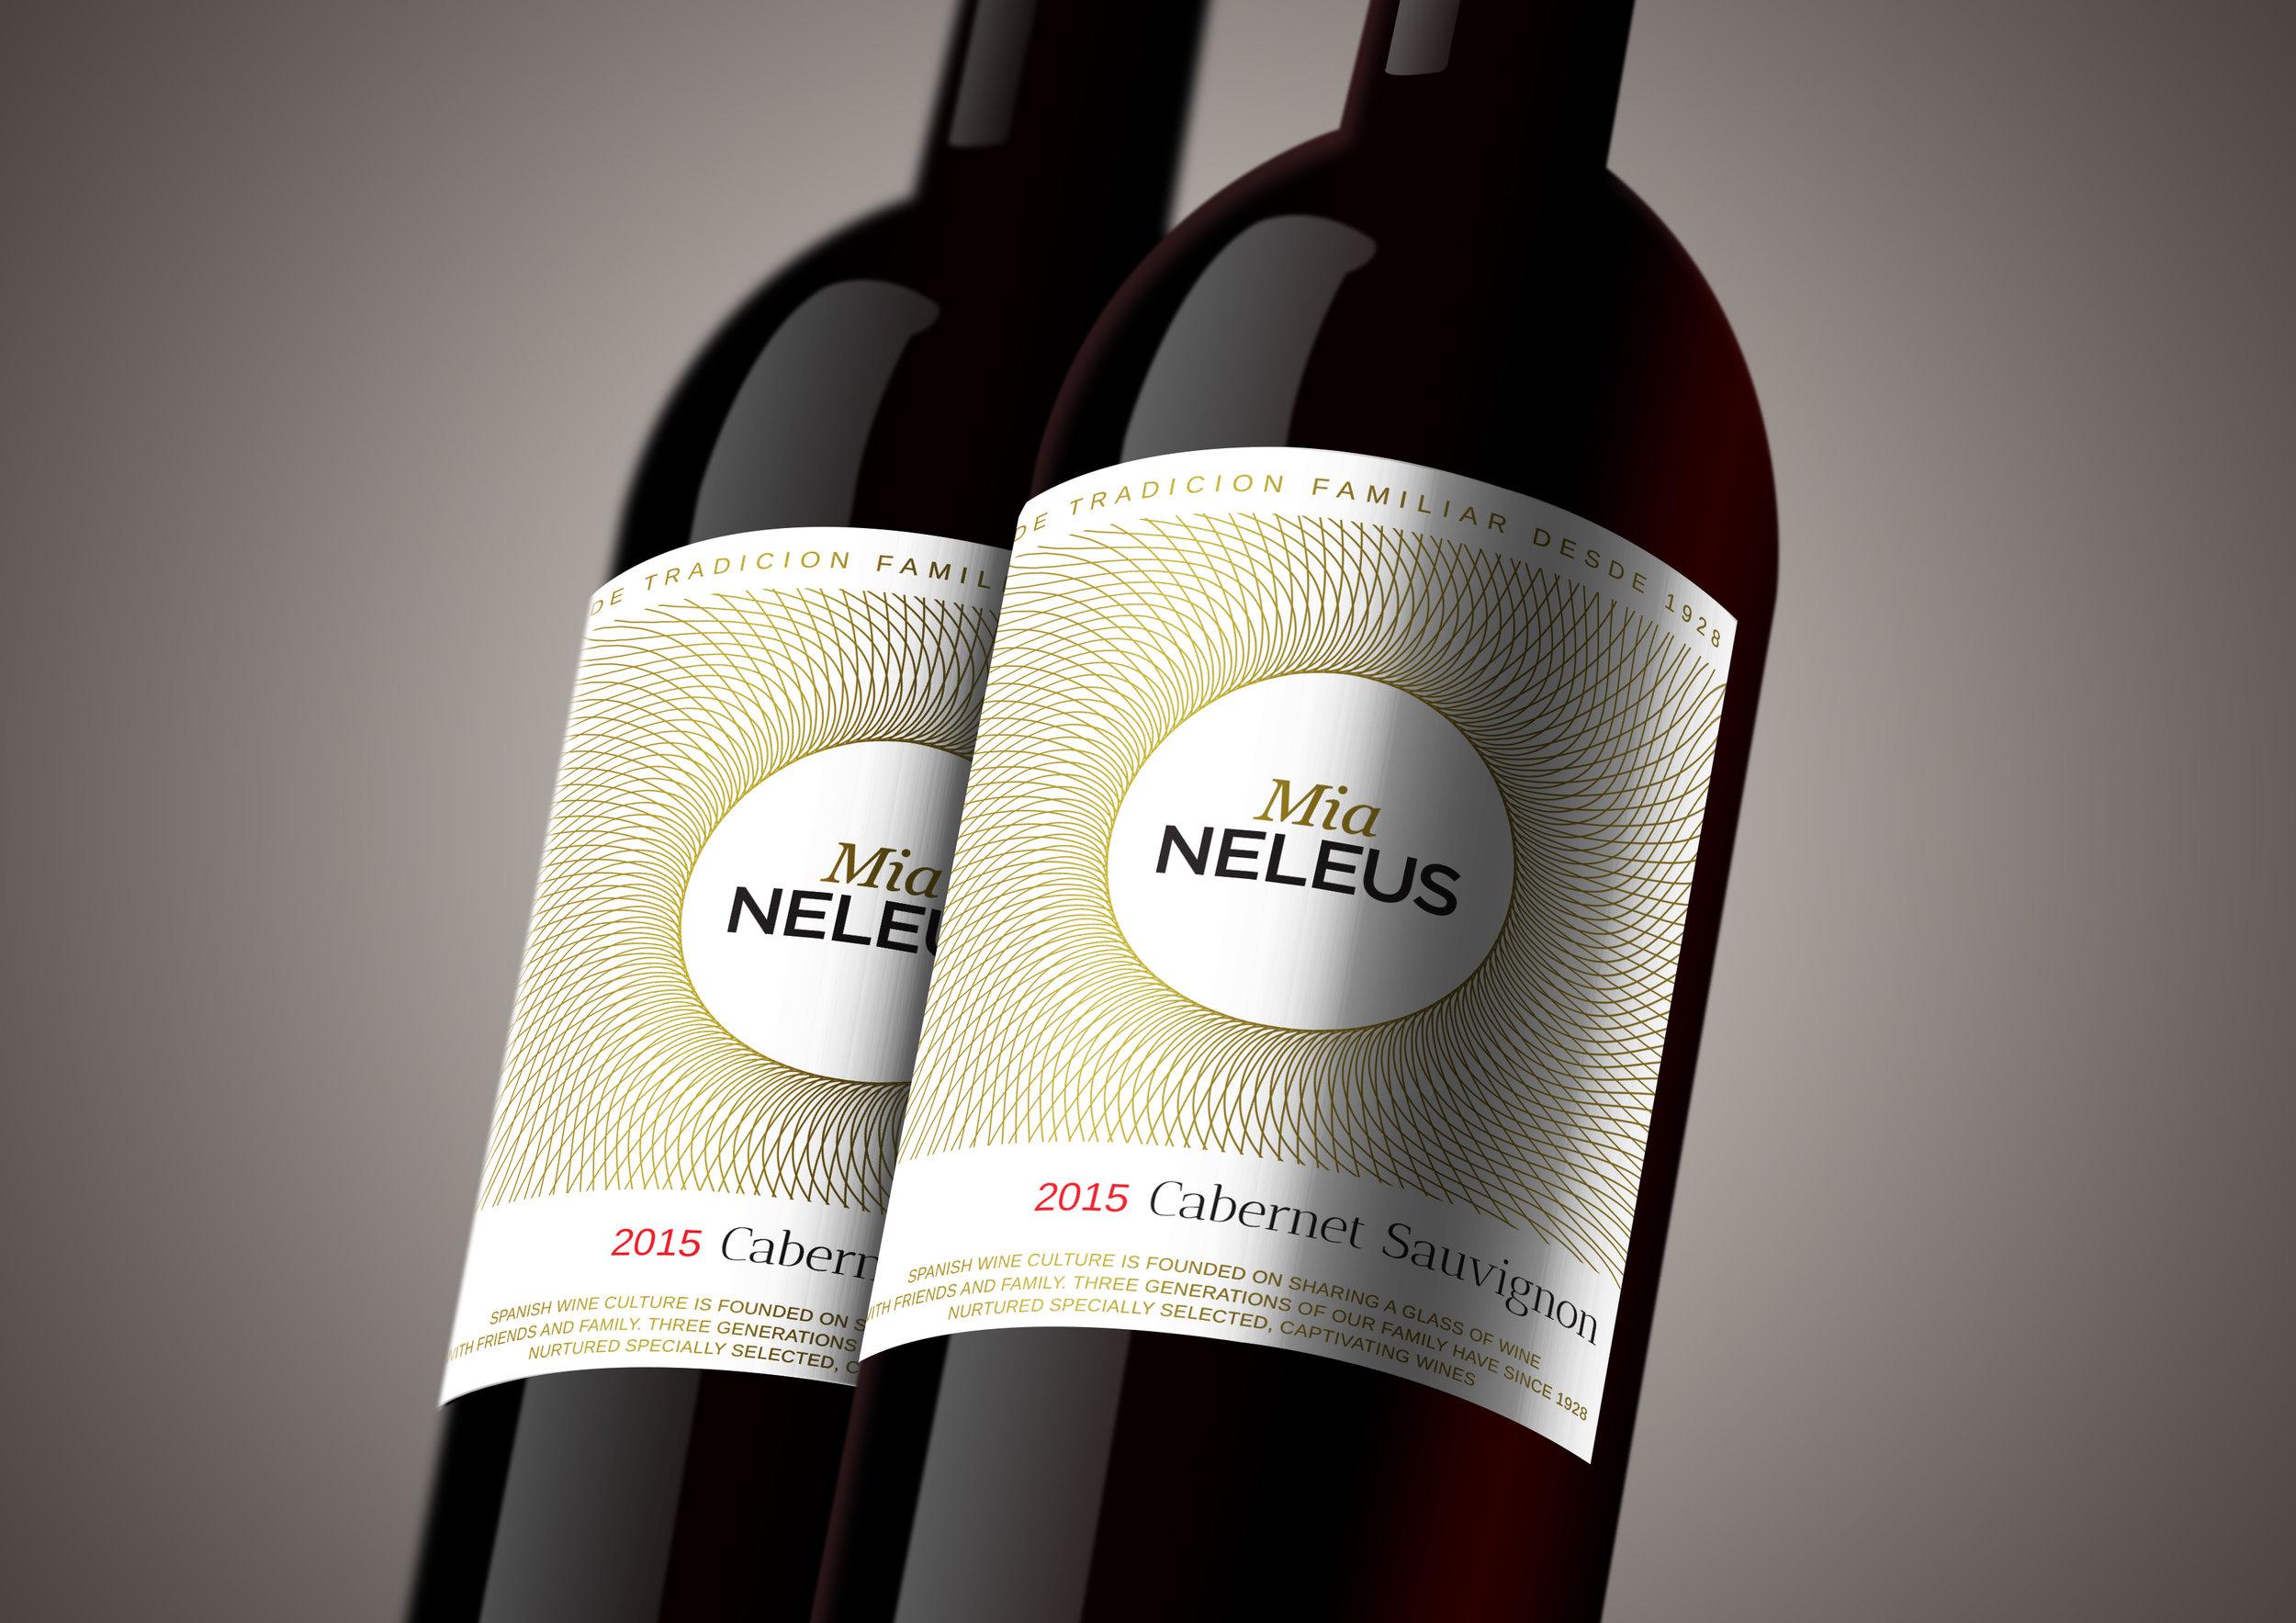 Mia Neleus 2 bottle shot.jpg